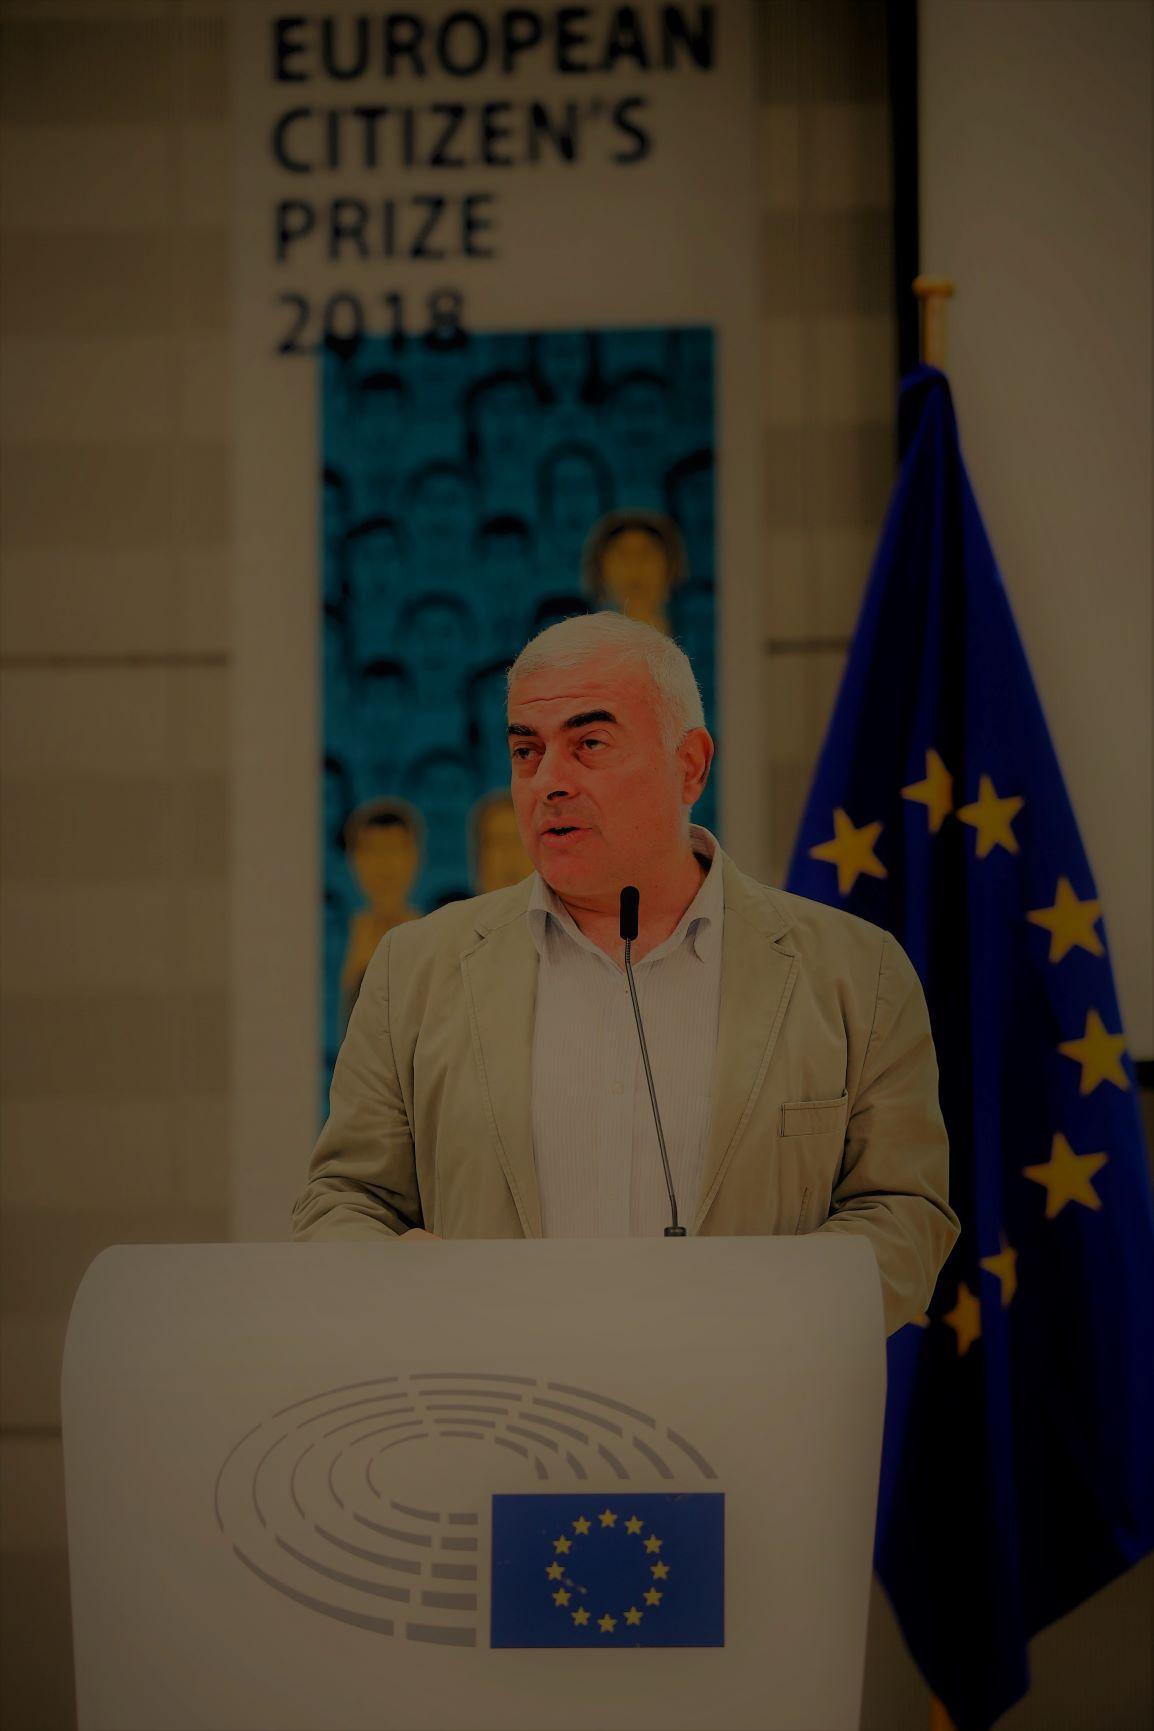 Mε αφορμή την απονομή του European Citizen's Prize: Άνεμος Ανανέωσης για την αναζωογόνηση του ευρωπαϊκού σχεδίου